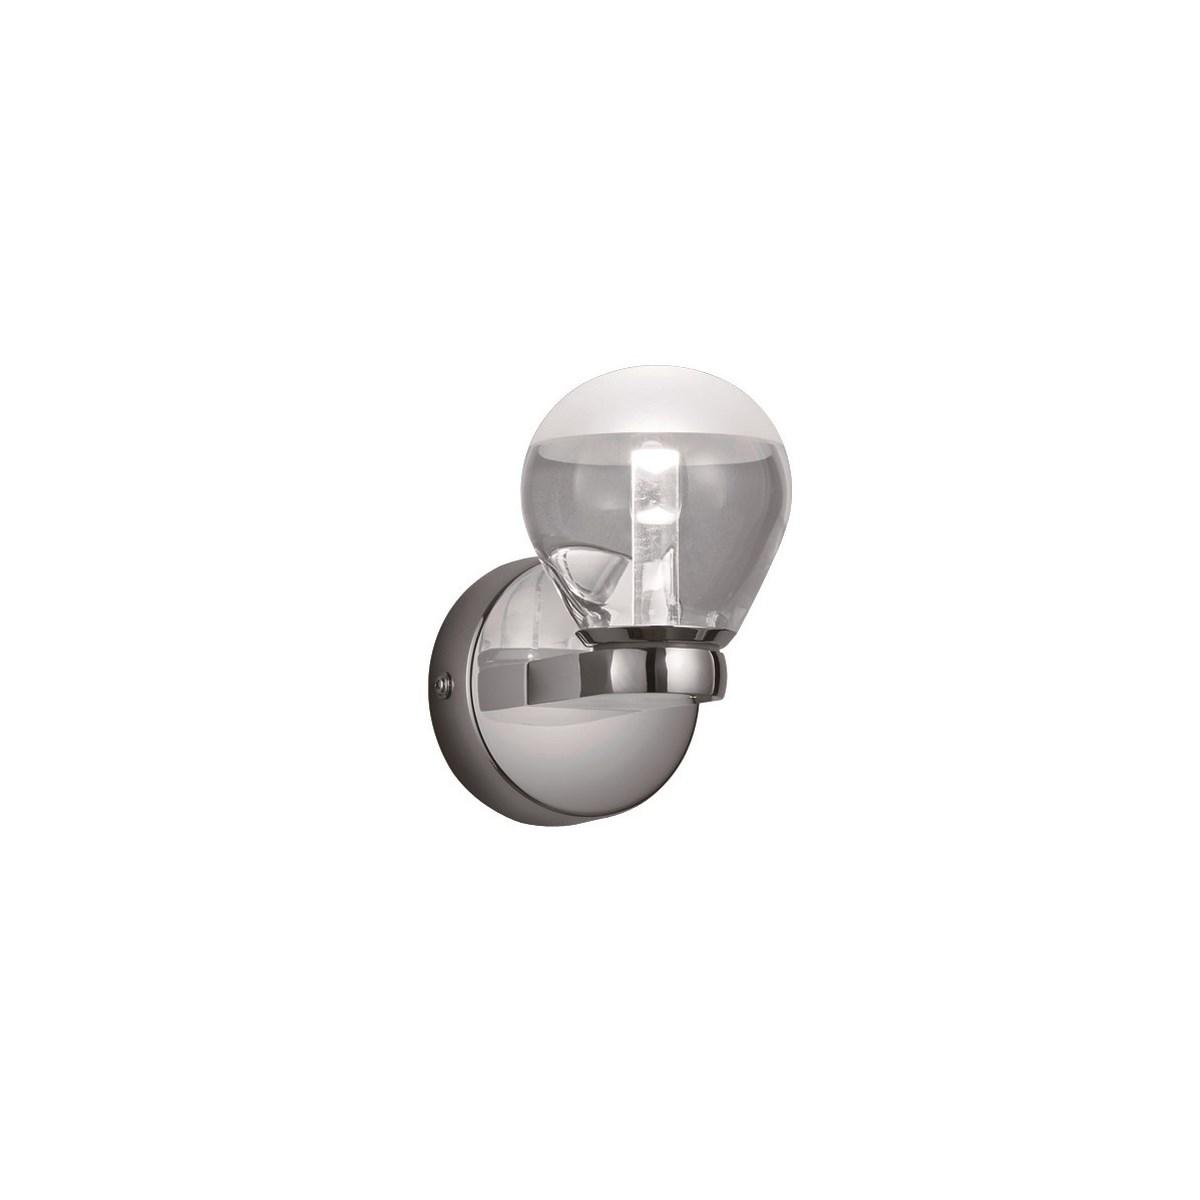 H2O 1 Light Bulb Wall Sconce in Chrome